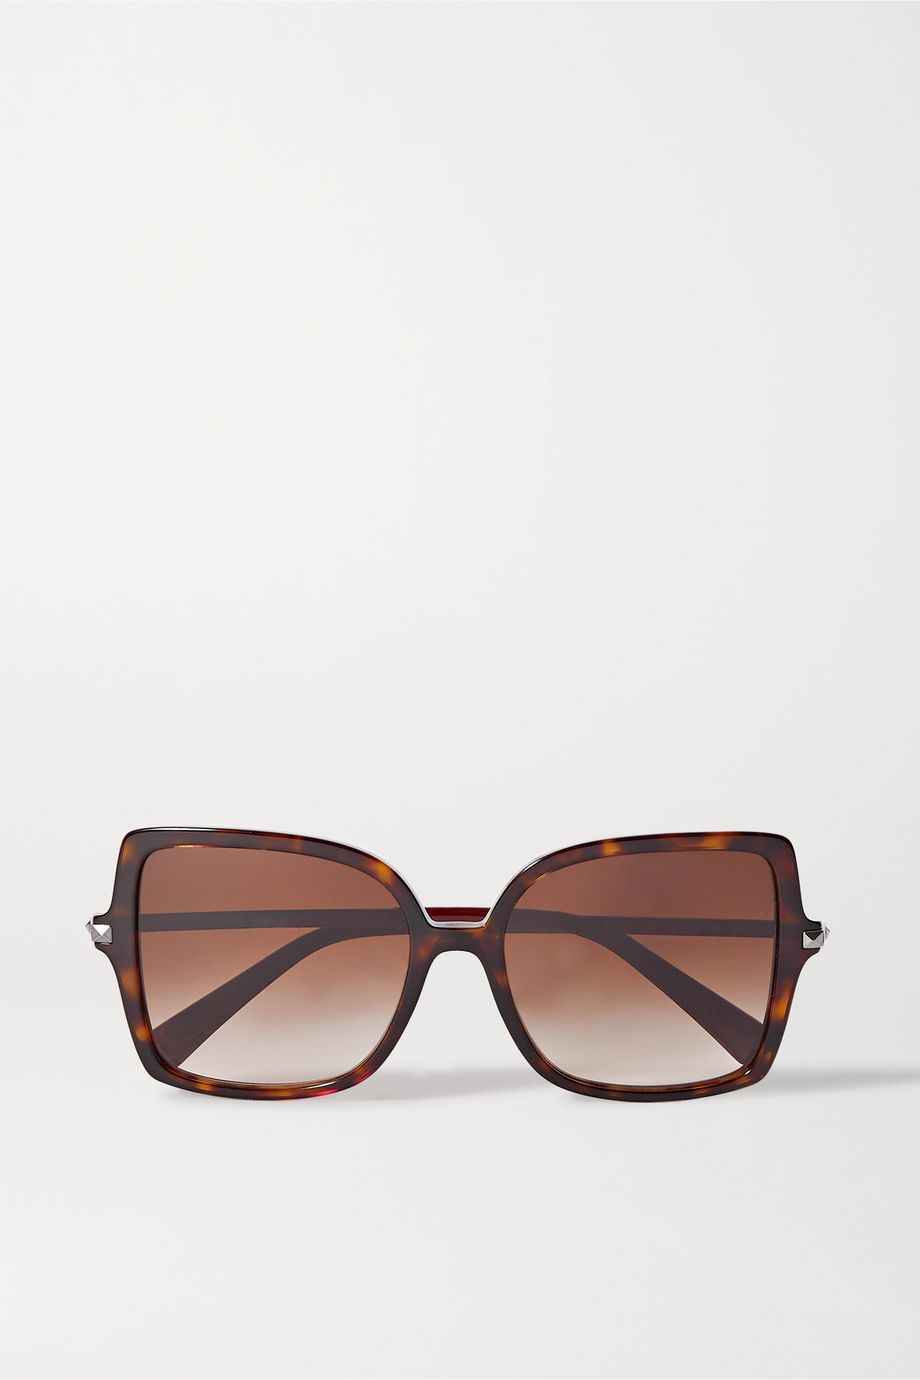 Valentino Valentino Garavani Rockstud oversized square-frame tortoiseshell acetate sunglasses